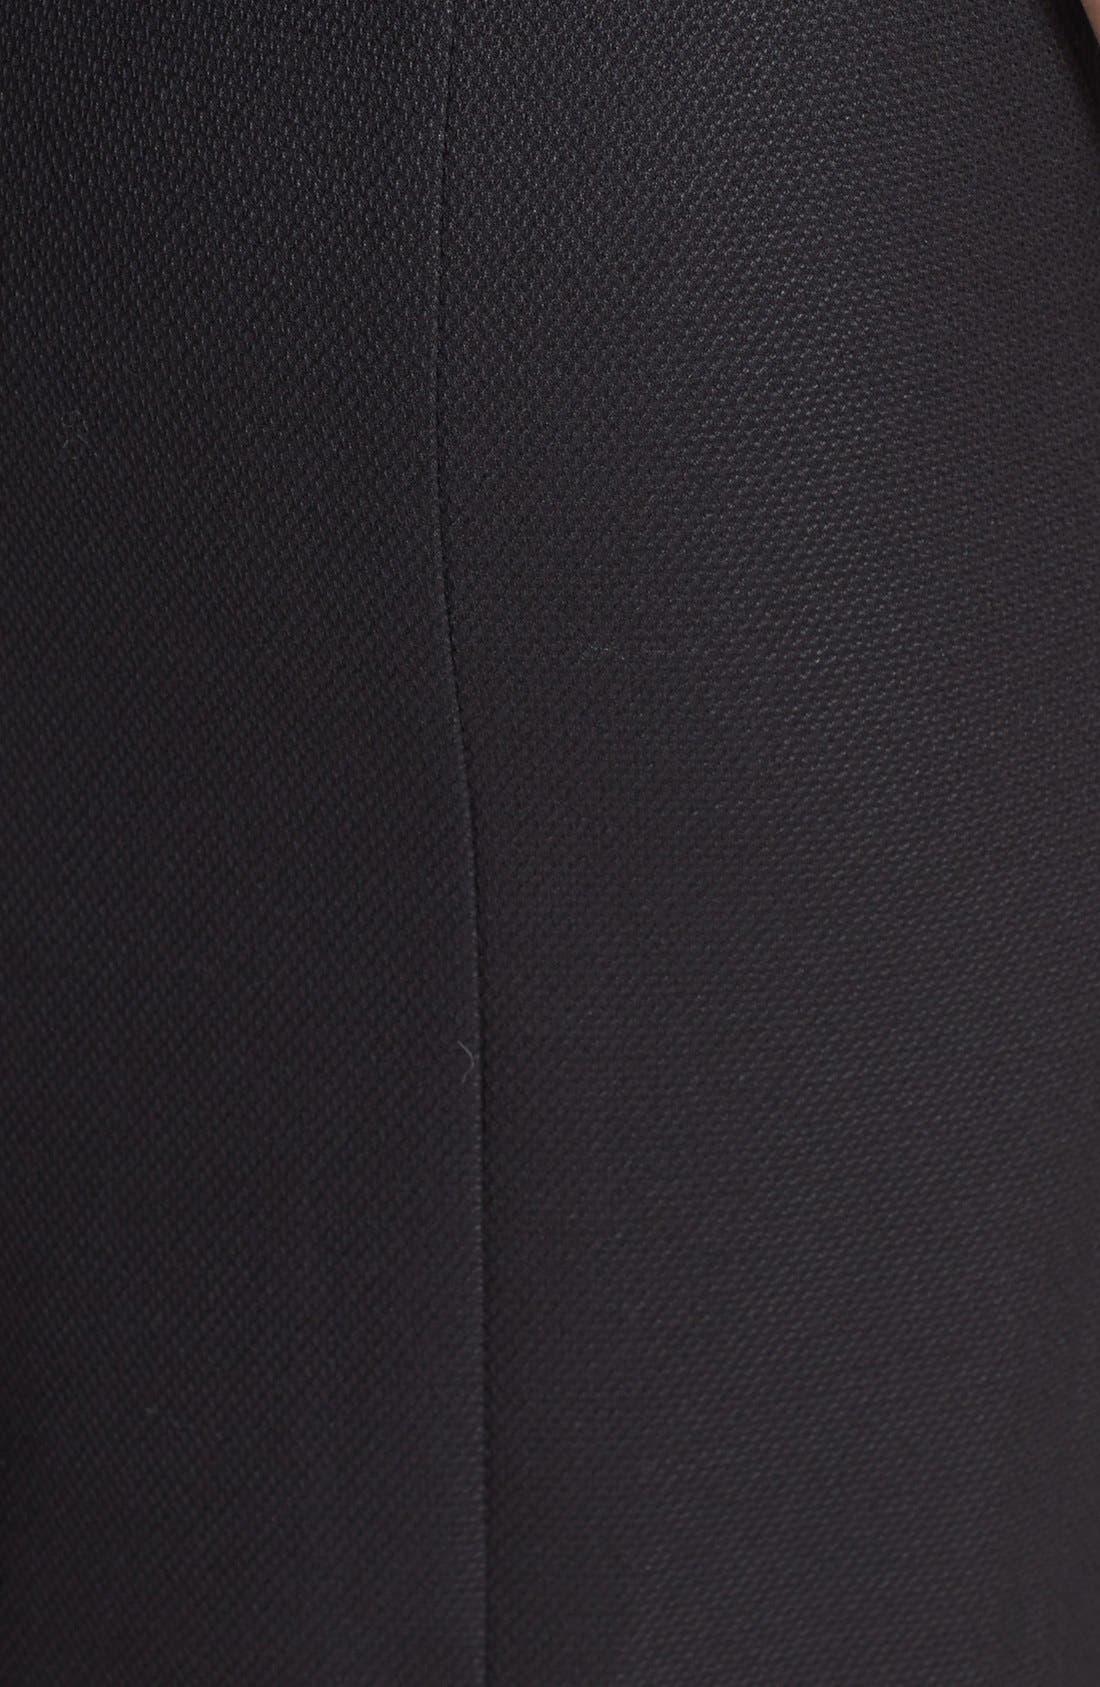 Alternate Image 3  - Halogen® Diamond Stretch Suit Skirt (Petite)